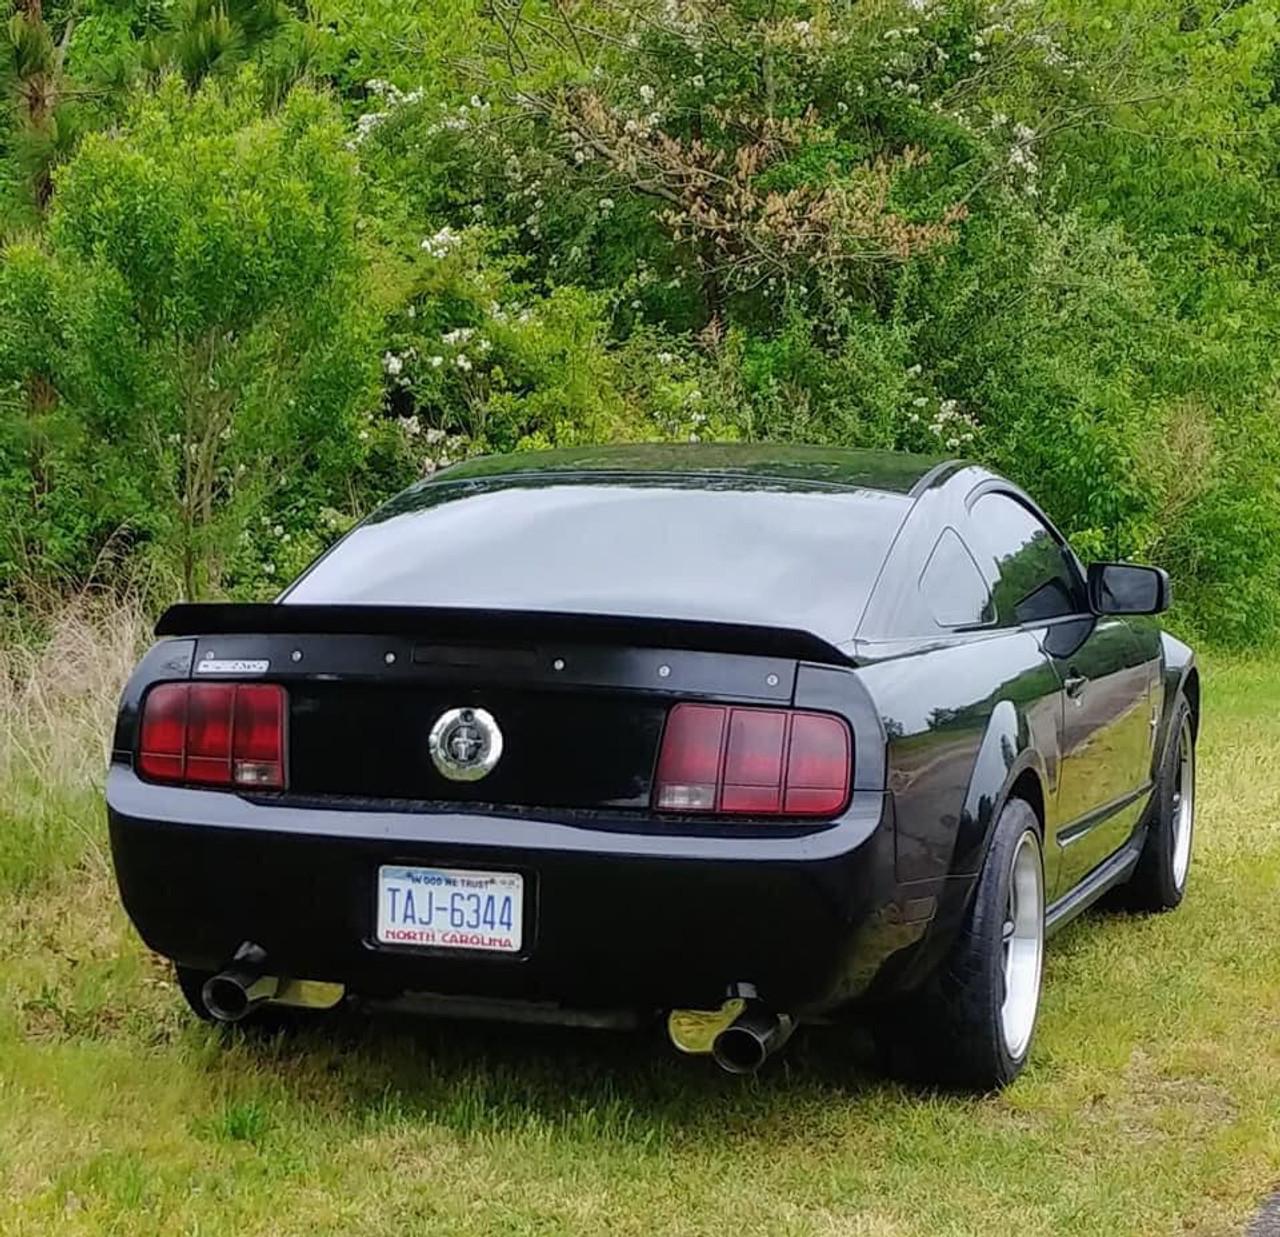 05-09 Mustang Rear Ducktail Spoiler (Welded Version)